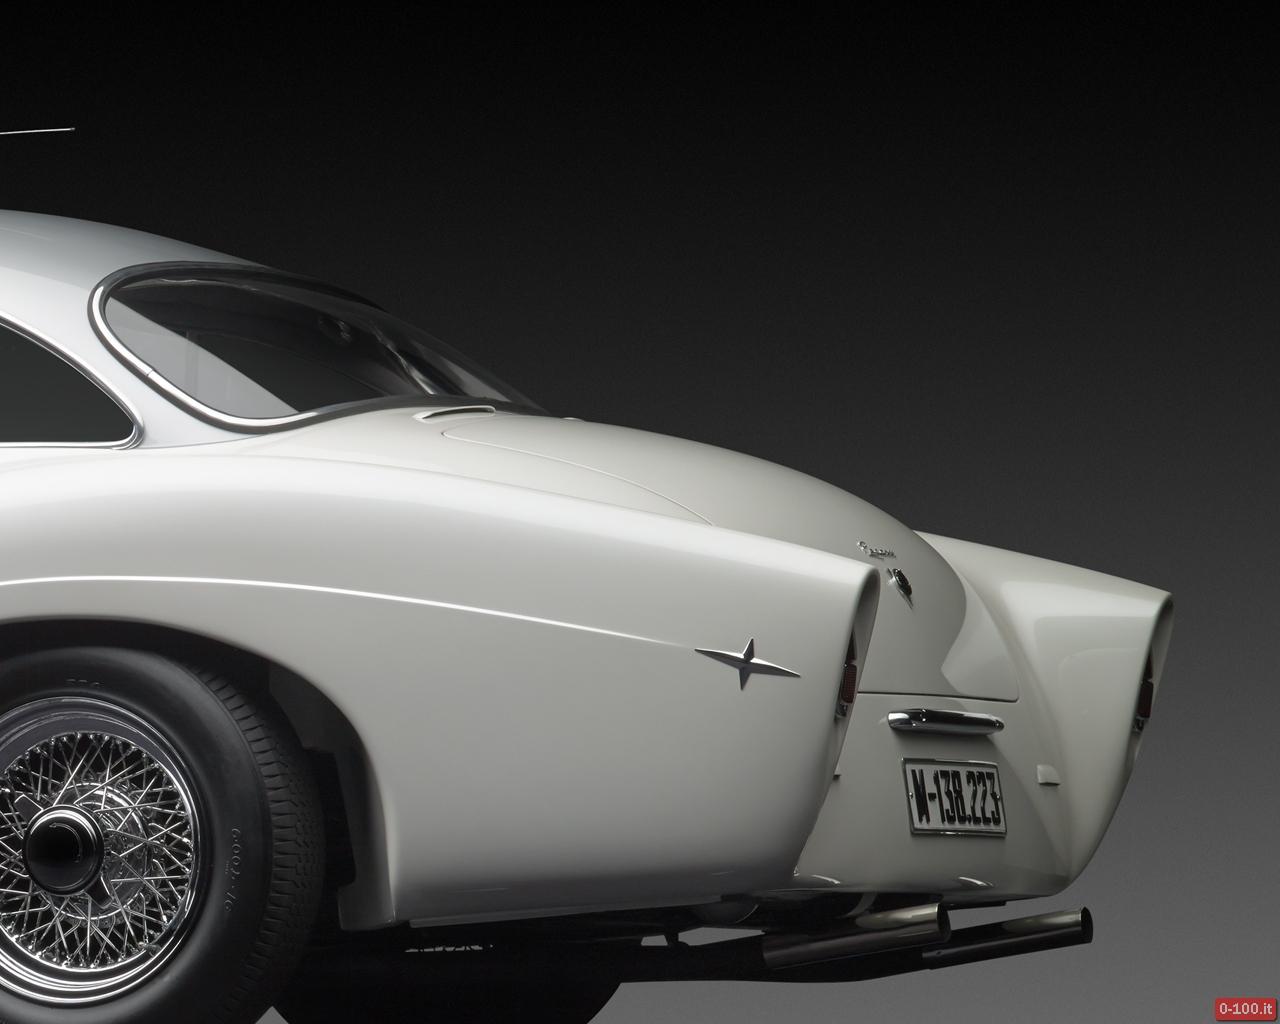 pegaso-z-102-berlinetta-serie-ii-by-carrosserie-j-saoutchik-rm-auctions_0-100_6